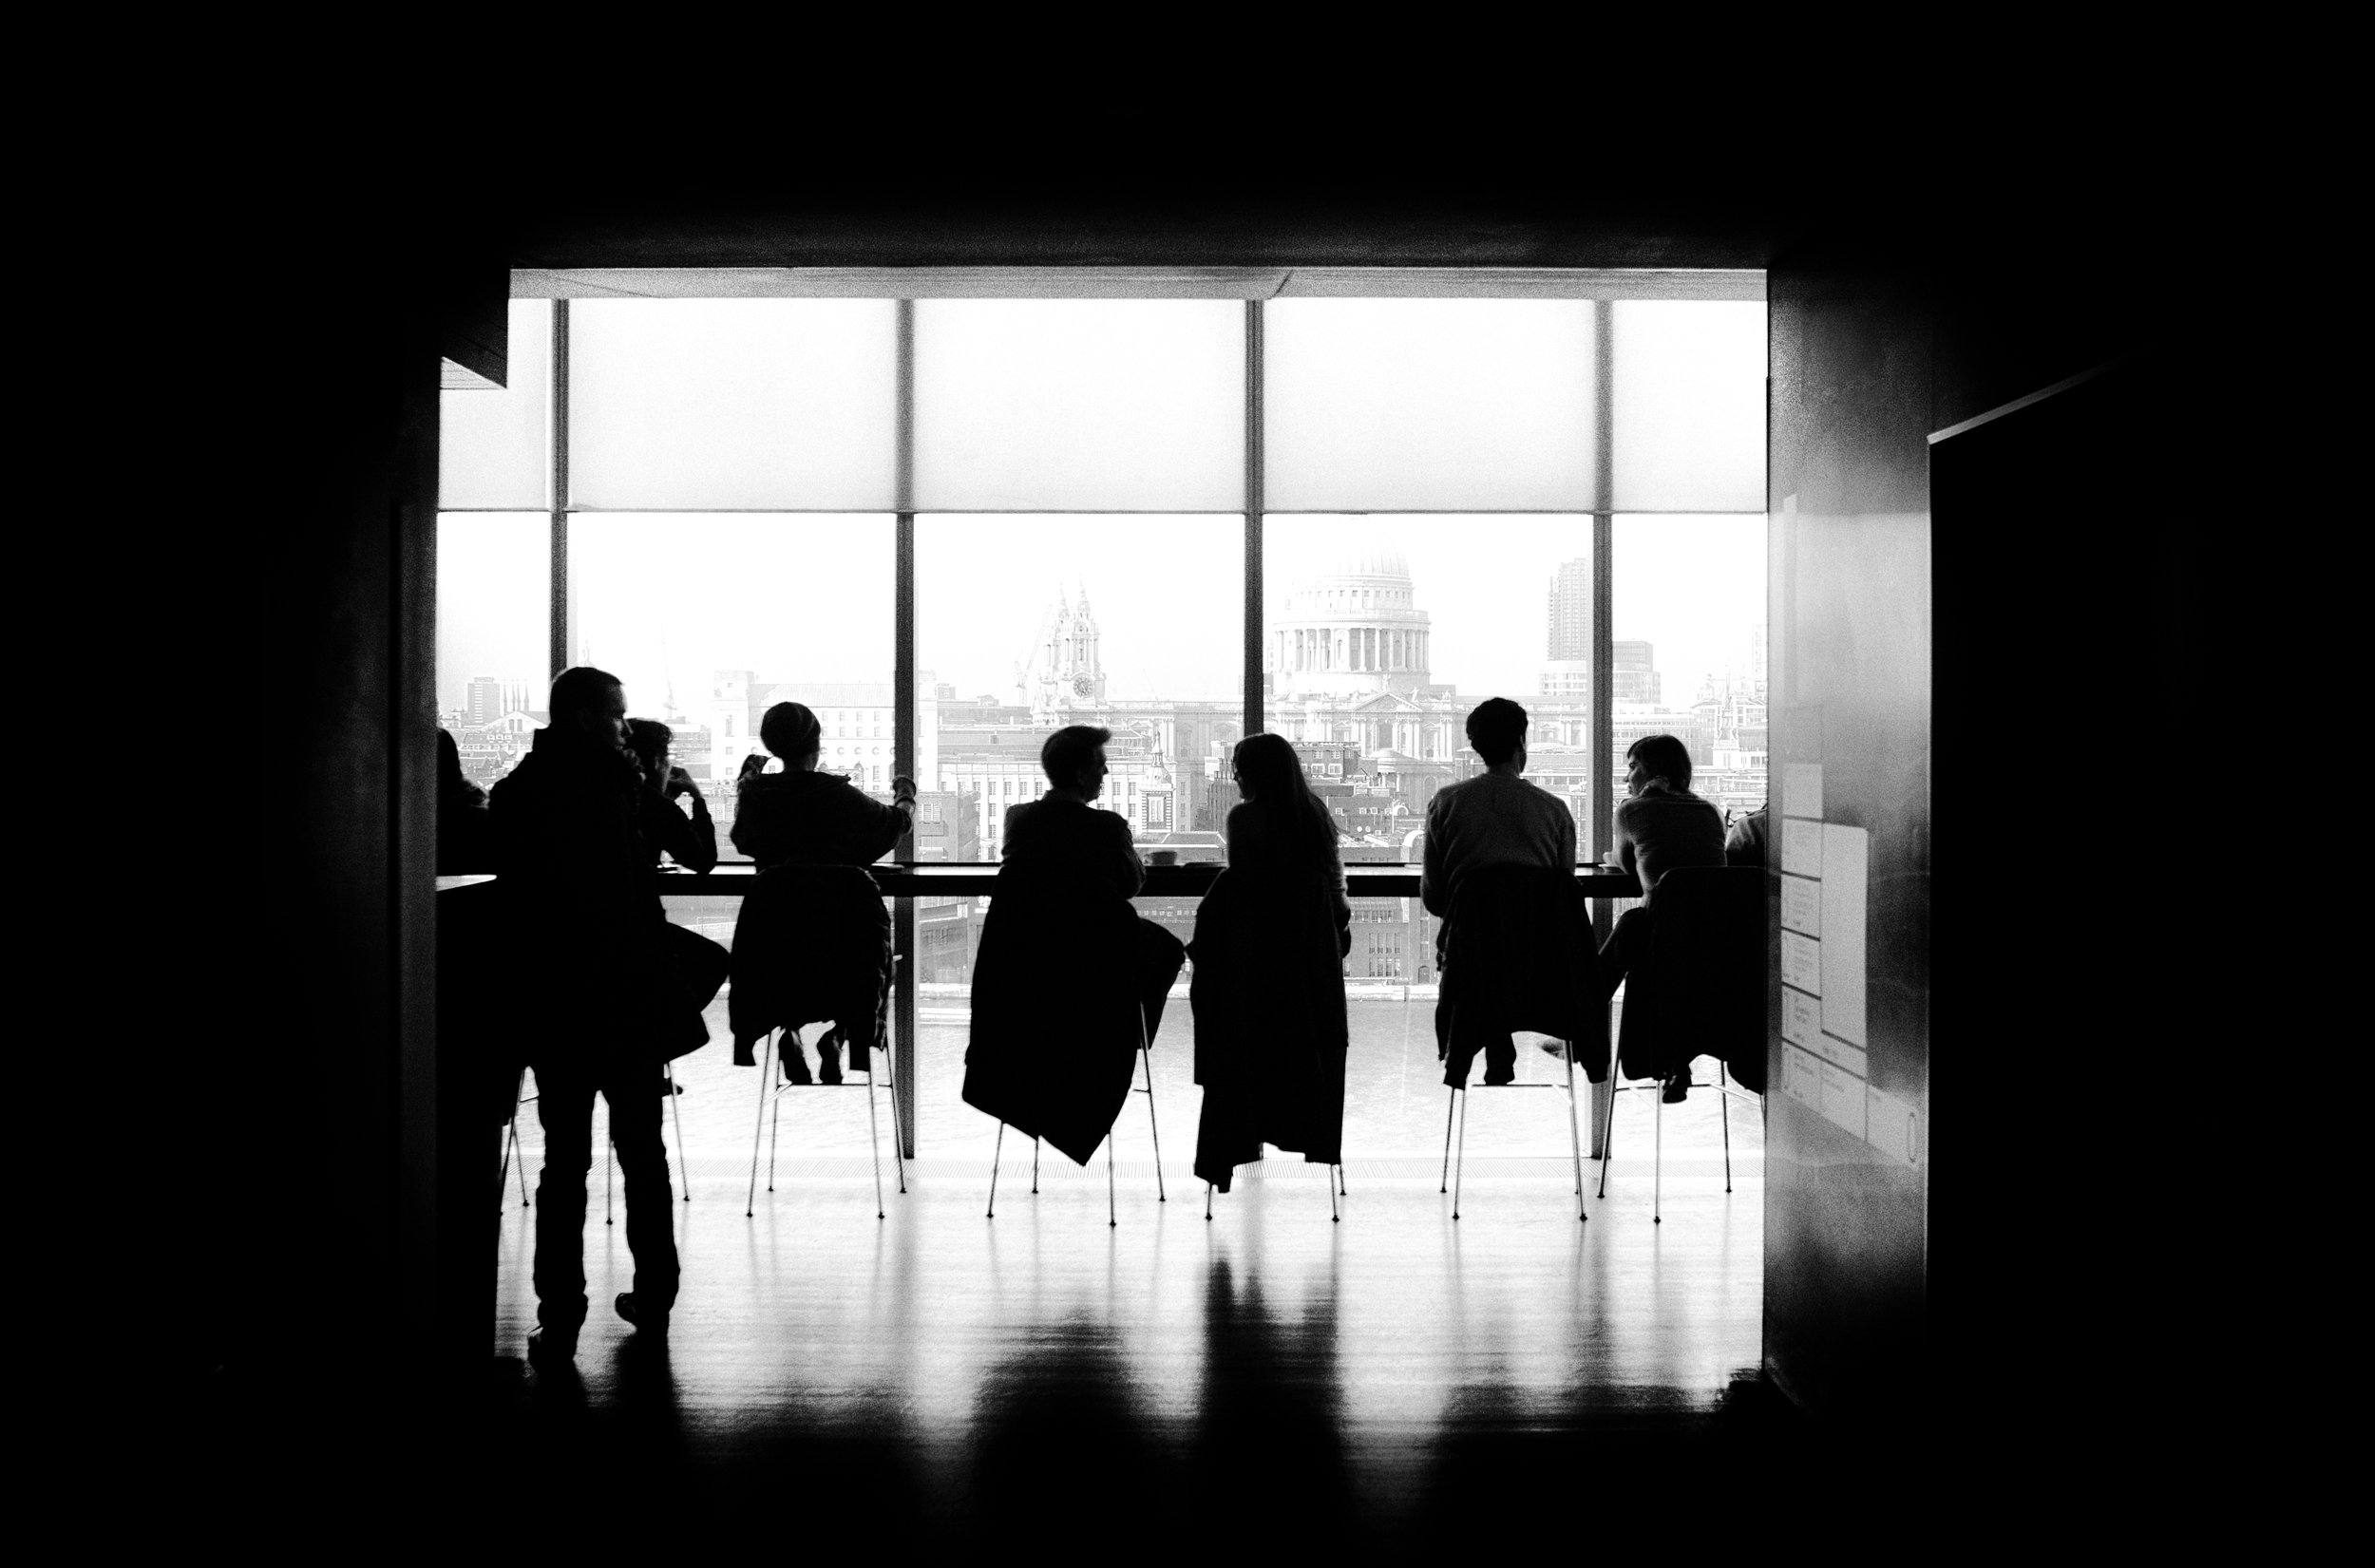 Uitgebreid internationaal team consultants - Harrison Talent Solutions